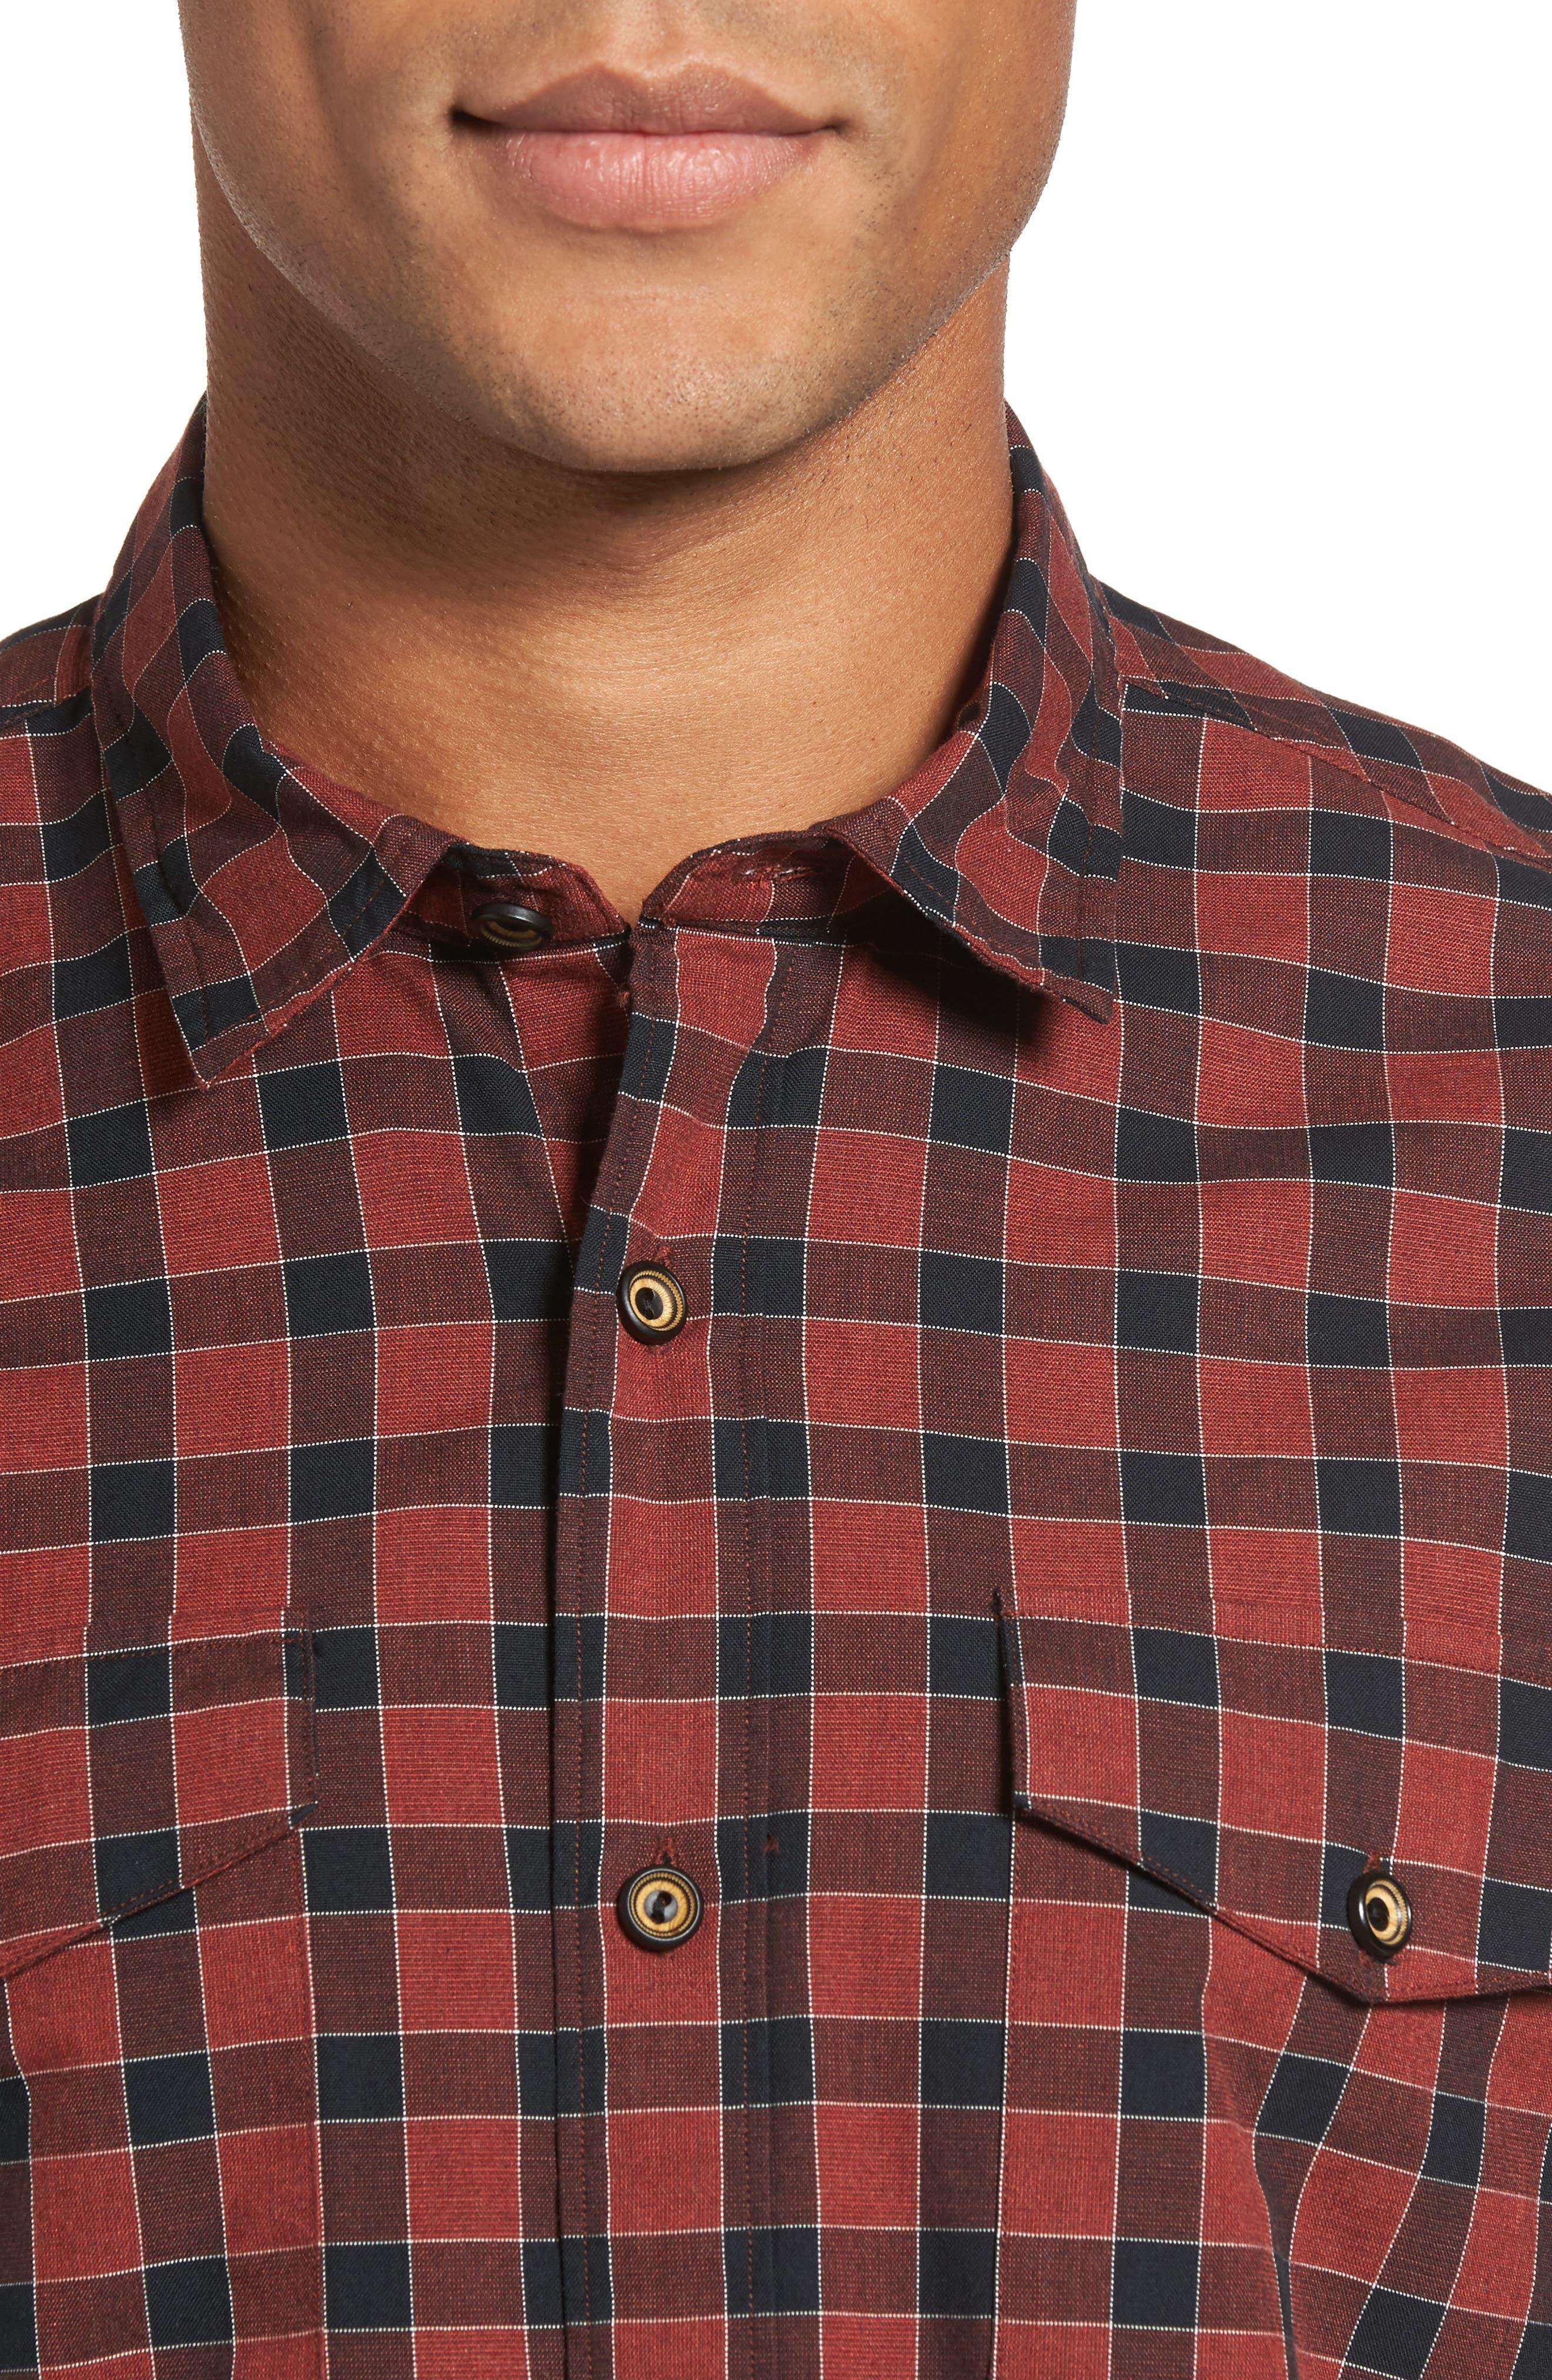 Lake Plaid Flannel Shirt,                             Alternate thumbnail 4, color,                             600